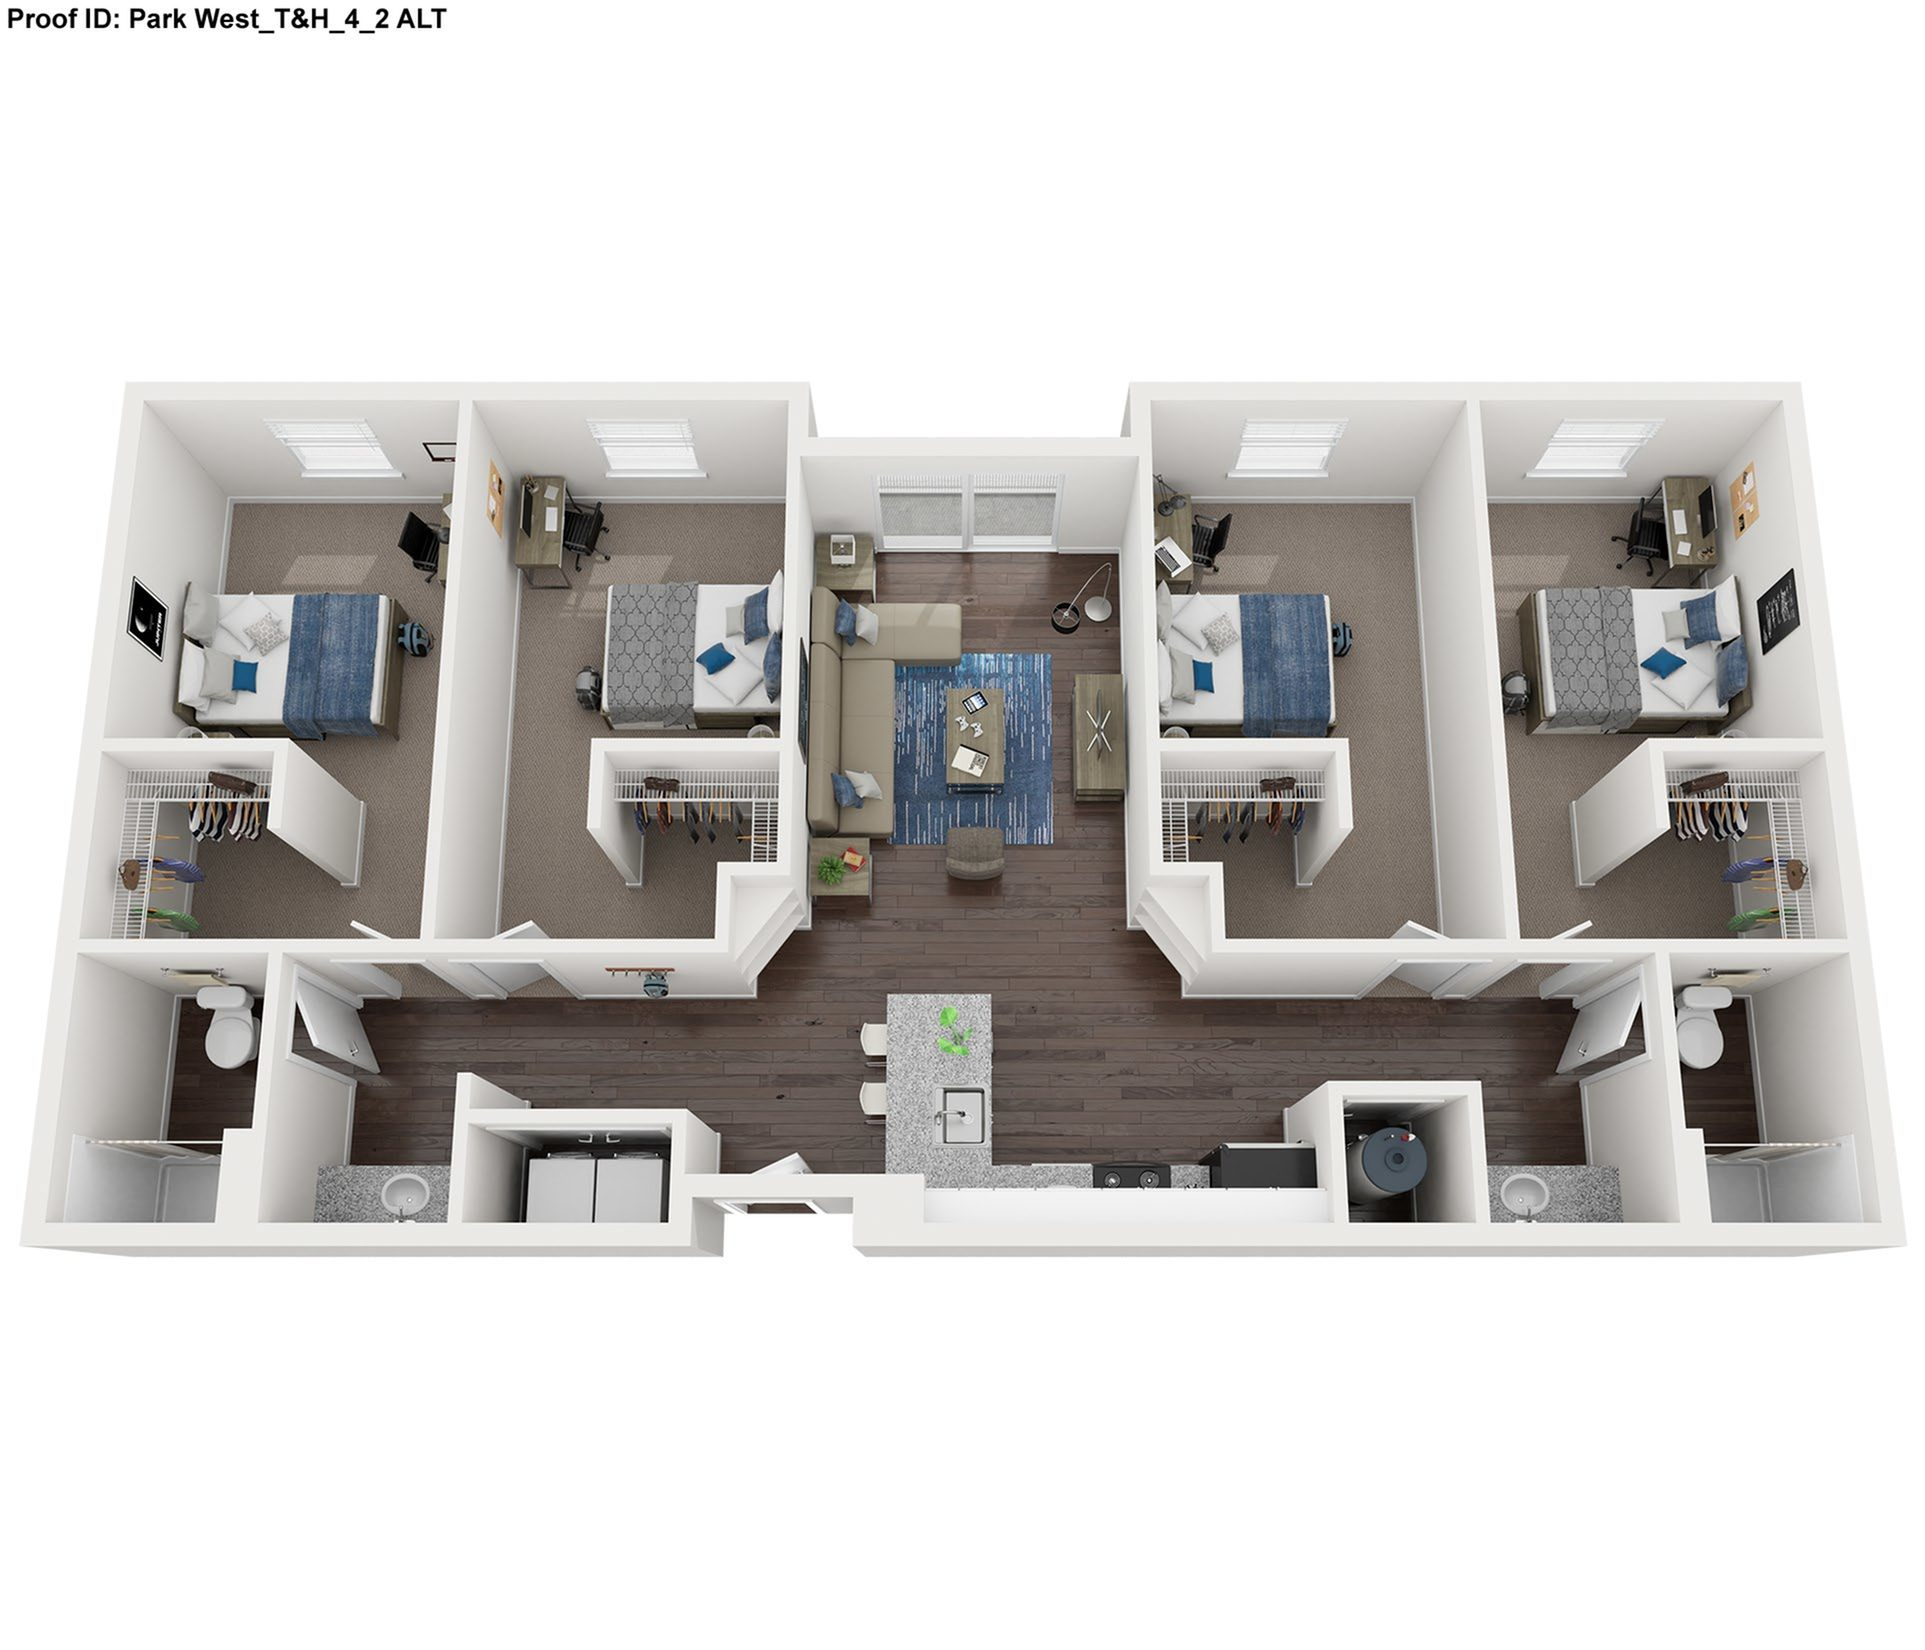 4 Bdrm 2 Bathroom Floor Plan